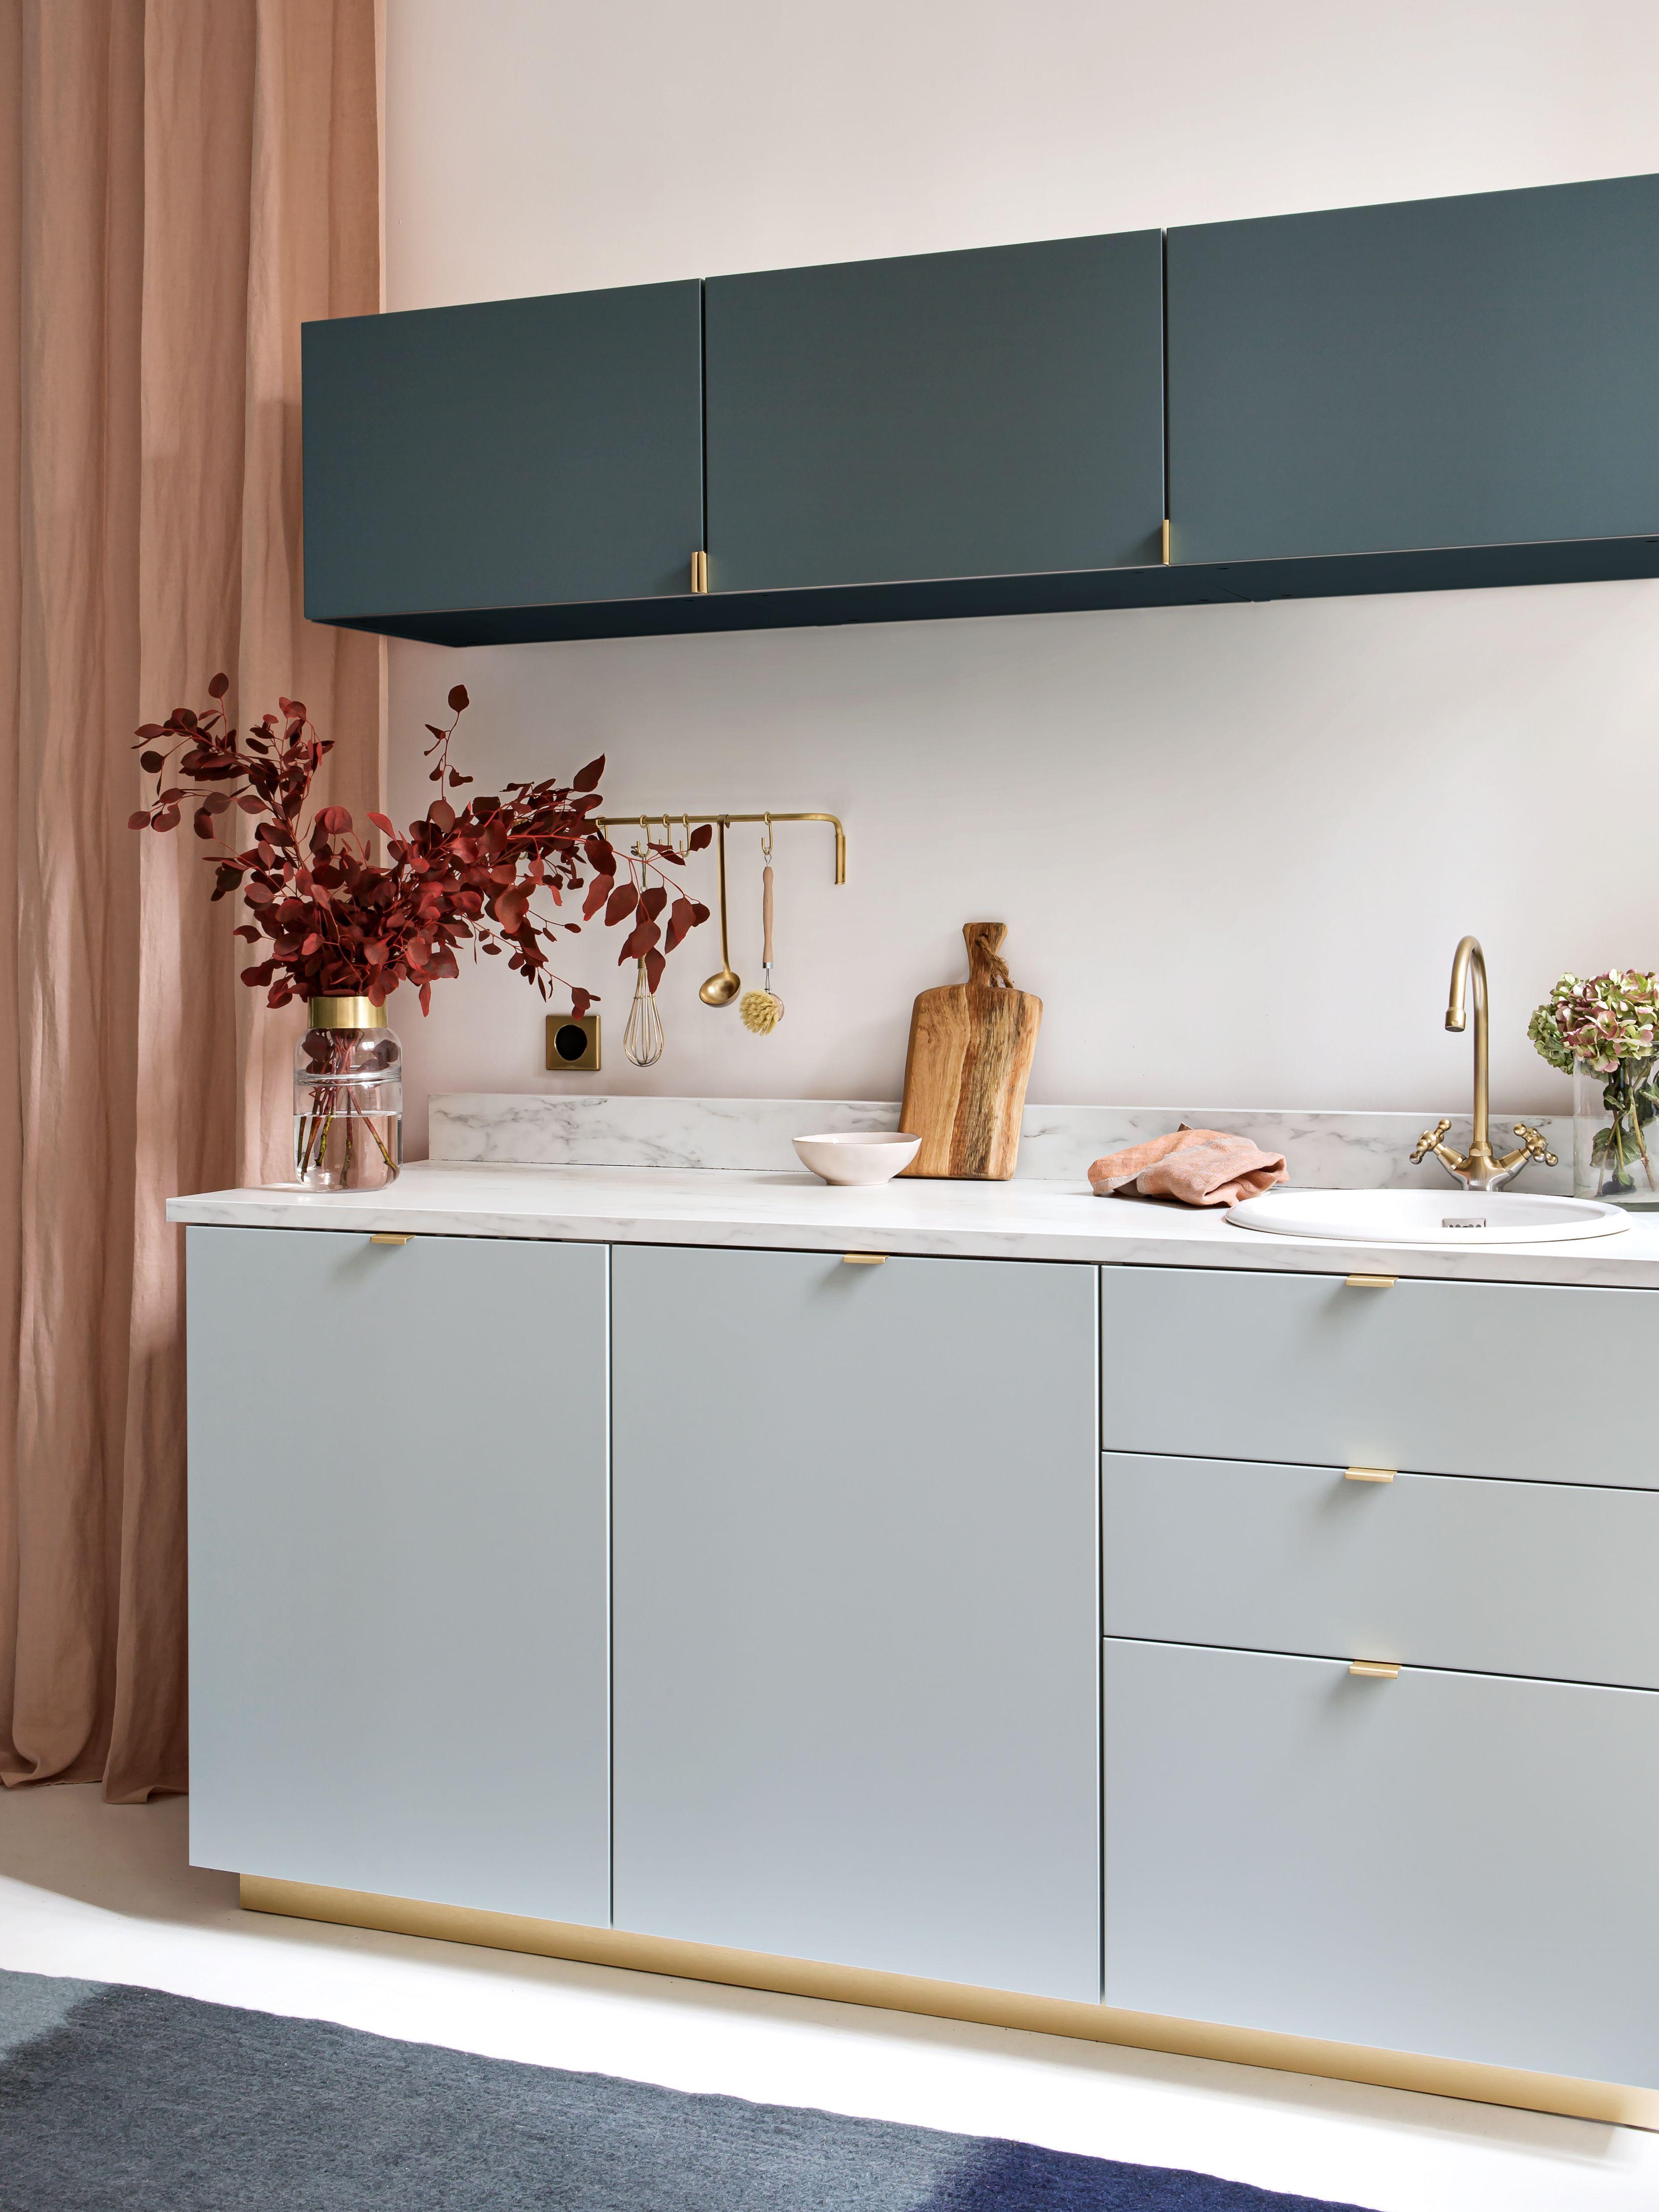 Cuisine Plum Bi Colore En 2020 Meuble Haut Cuisine Ikea Meuble Haut Cuisine Meuble Cuisine